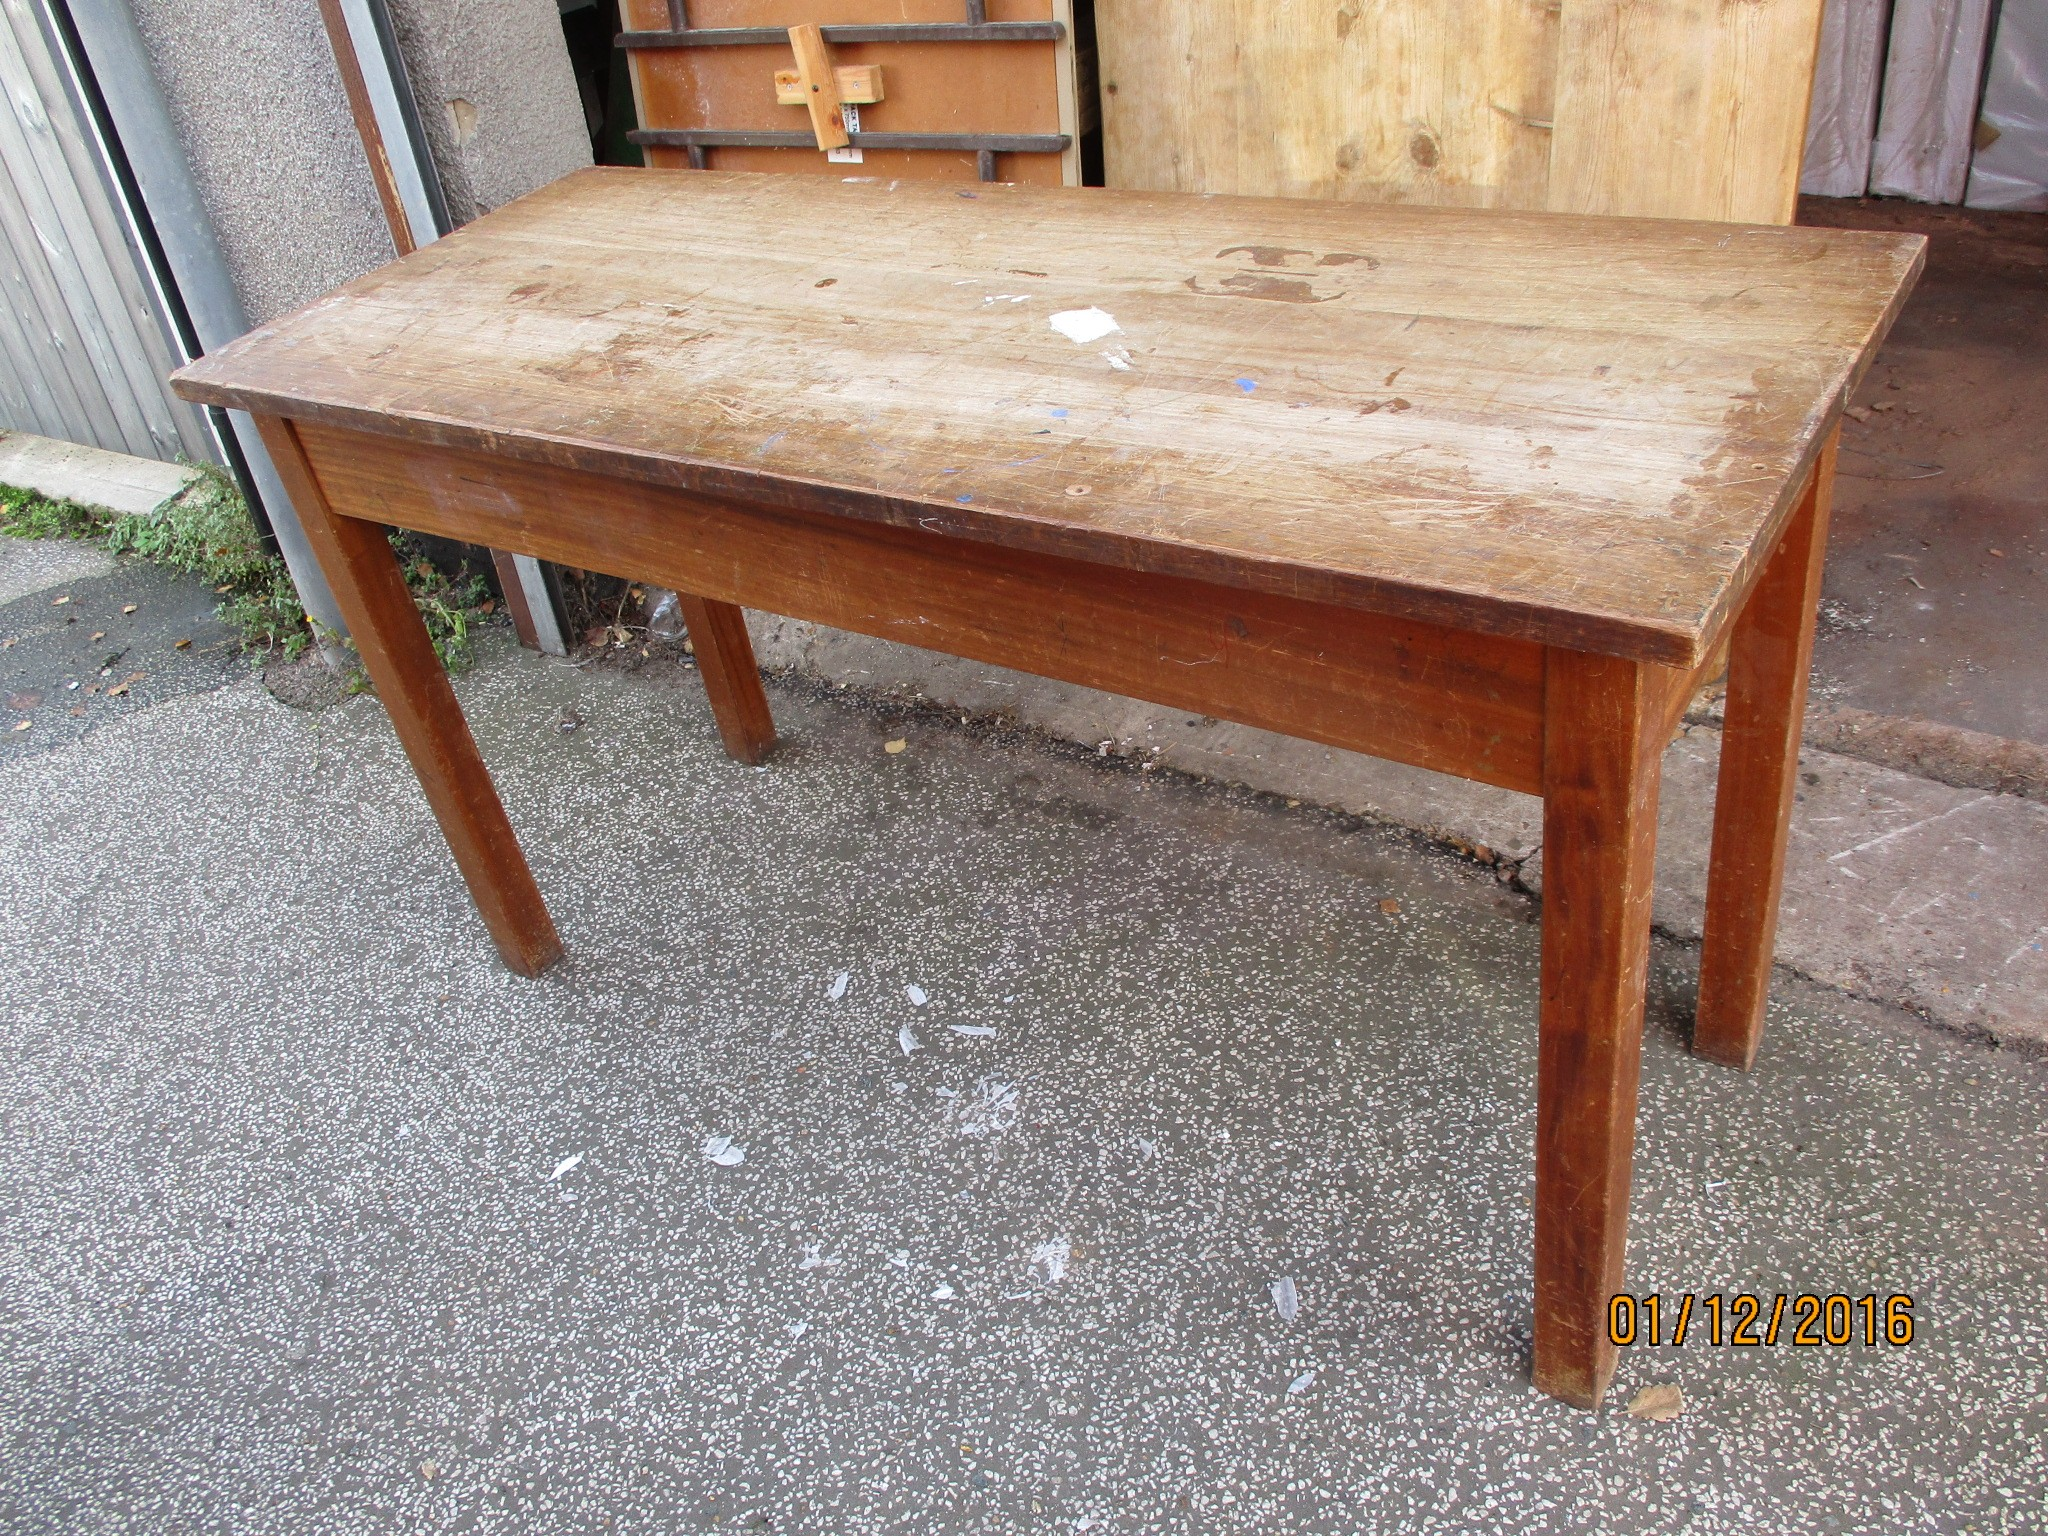 Table - school science table 60cm x 150cm x 85cm